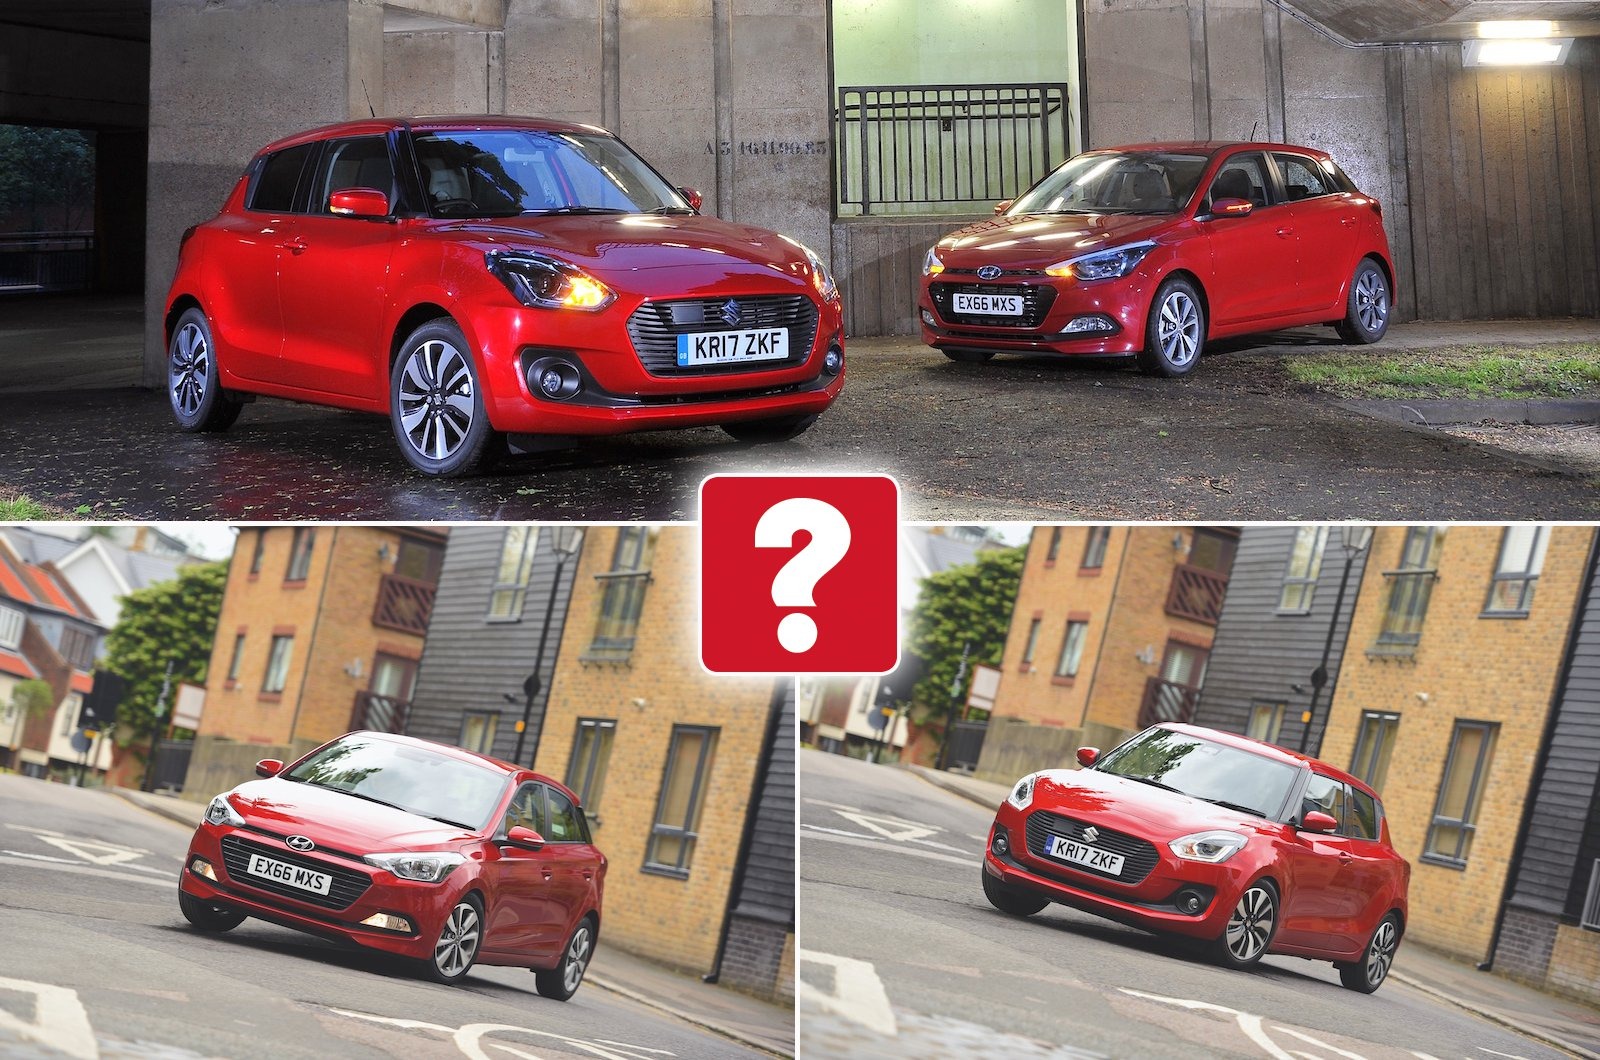 Used test: Hyundai i20 vs Suzuki Swift